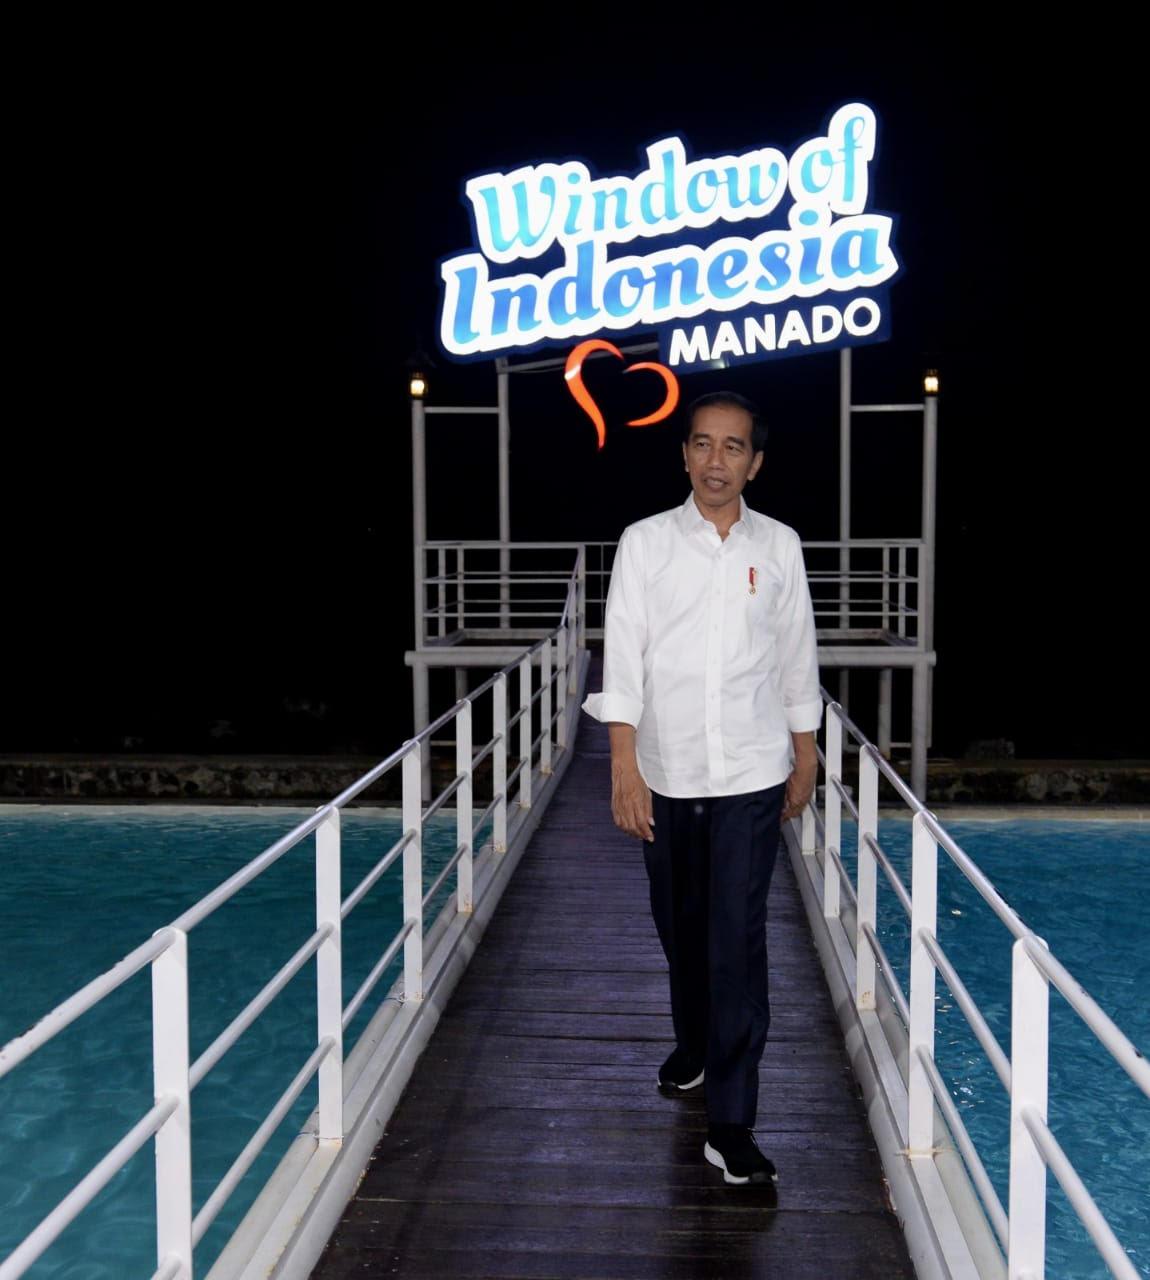 https: img-z.okeinfo.net content 2019 07 05 406 2075007 saat-presiden-jokowi-menikmati-wisata-jendela-indonesia-re6YJbIKBk.jpg